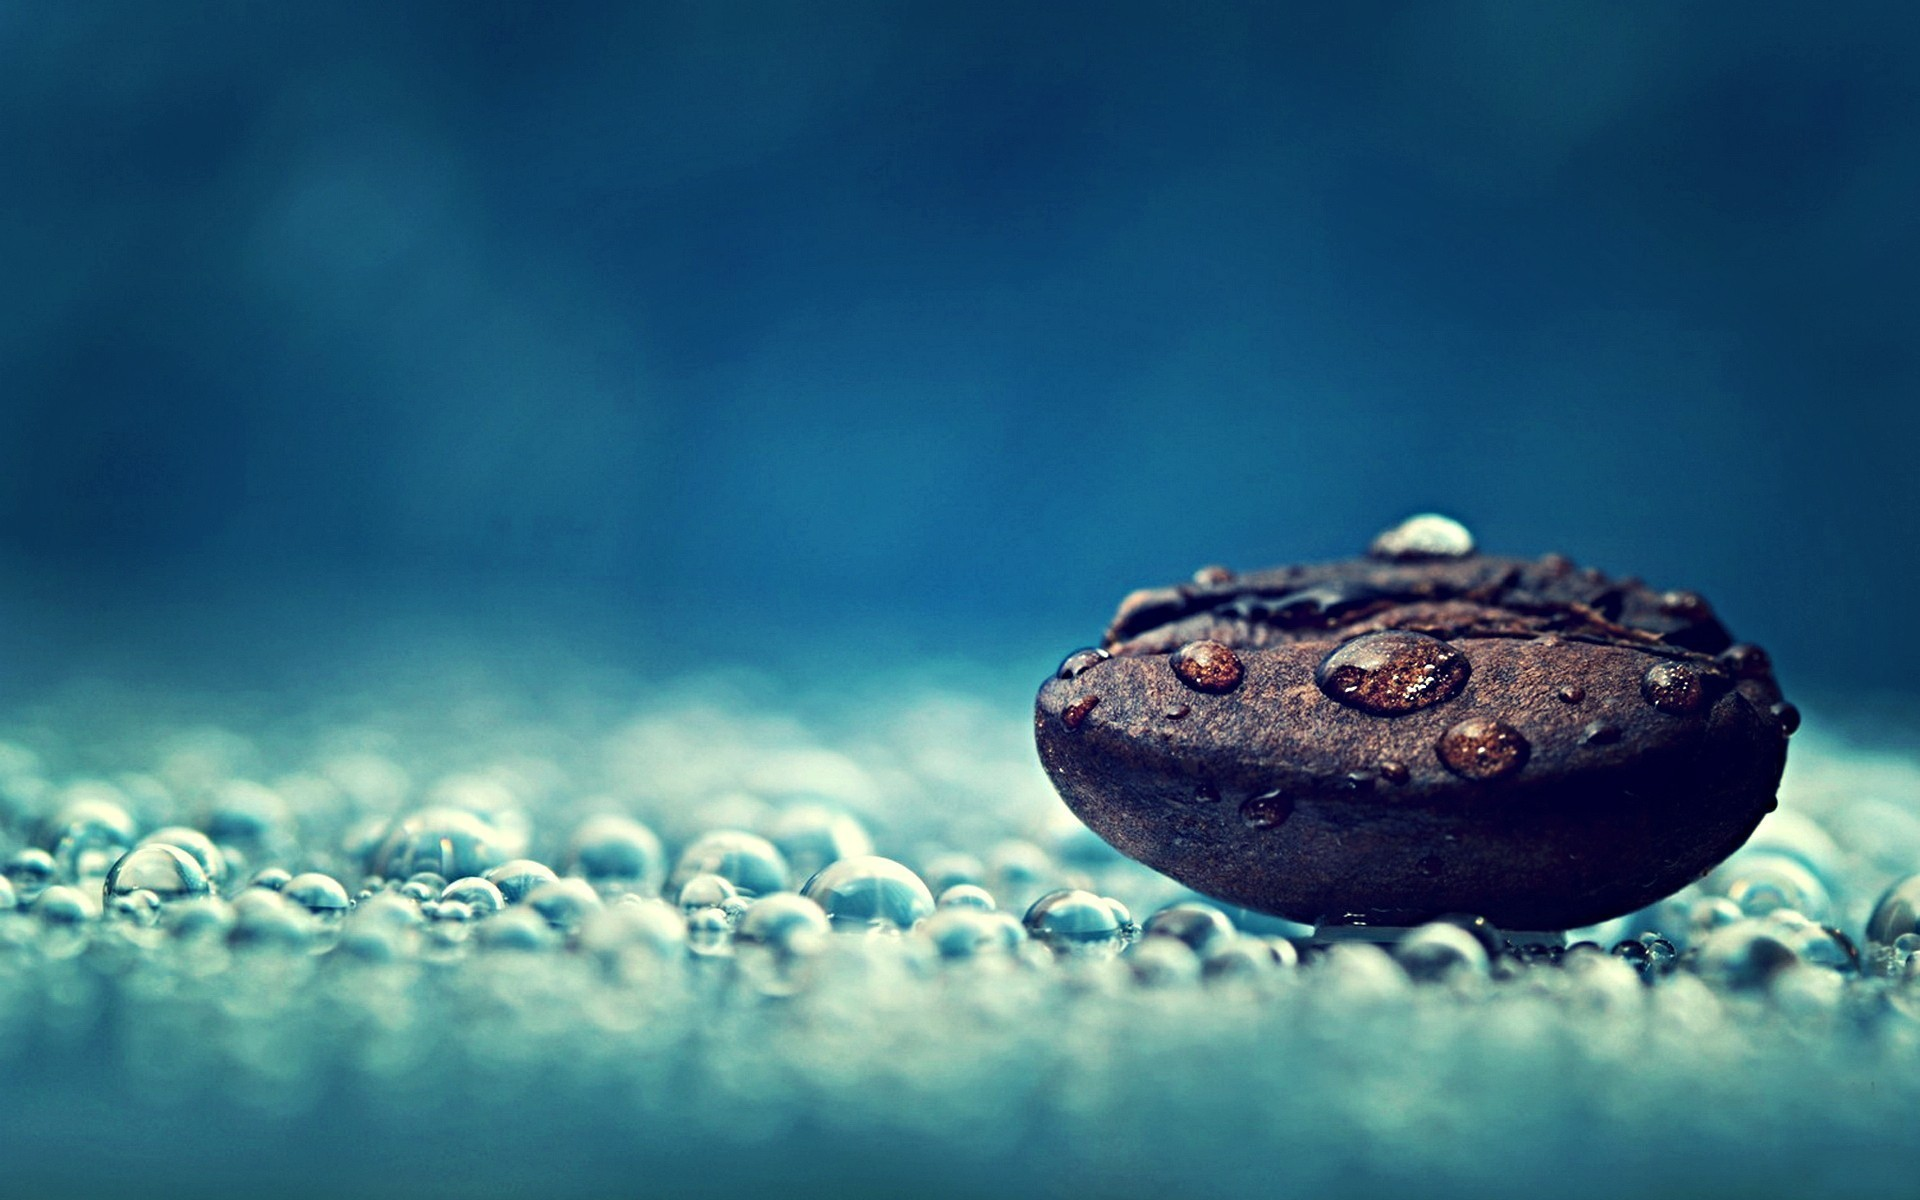 Coffee bean water drops close-up macro photography Free HD Wallpaper